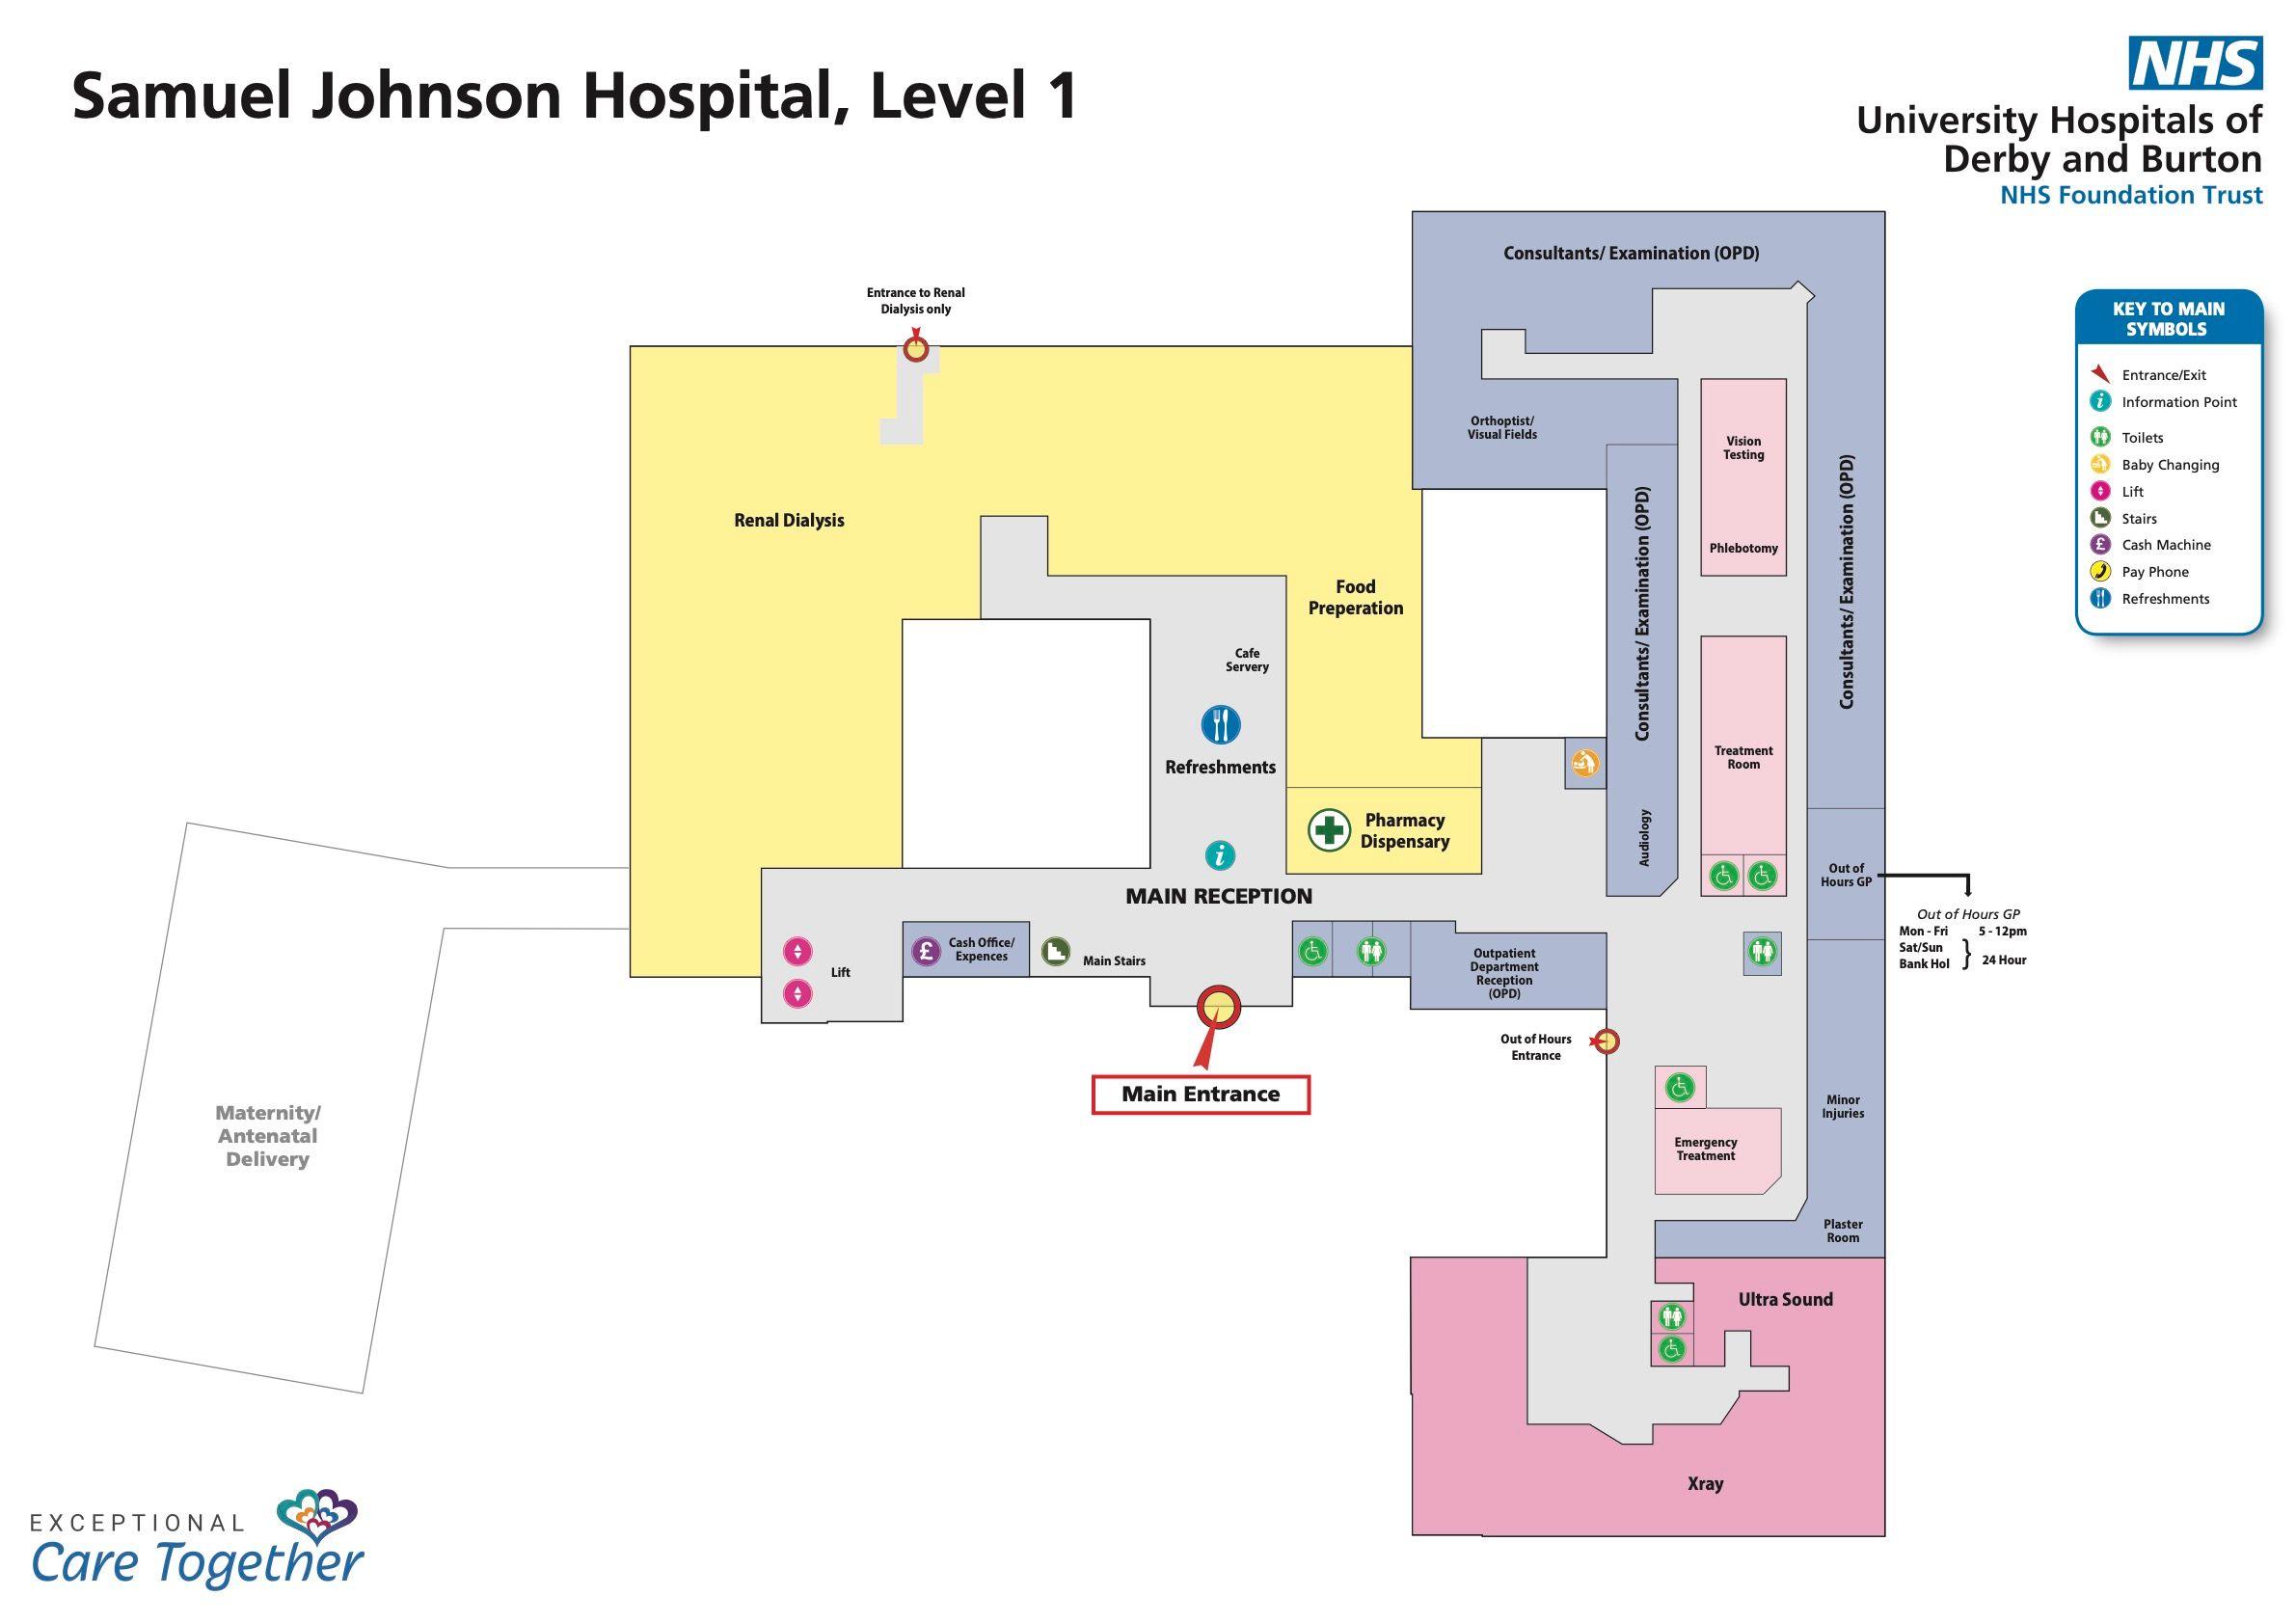 samuel johnson hospital